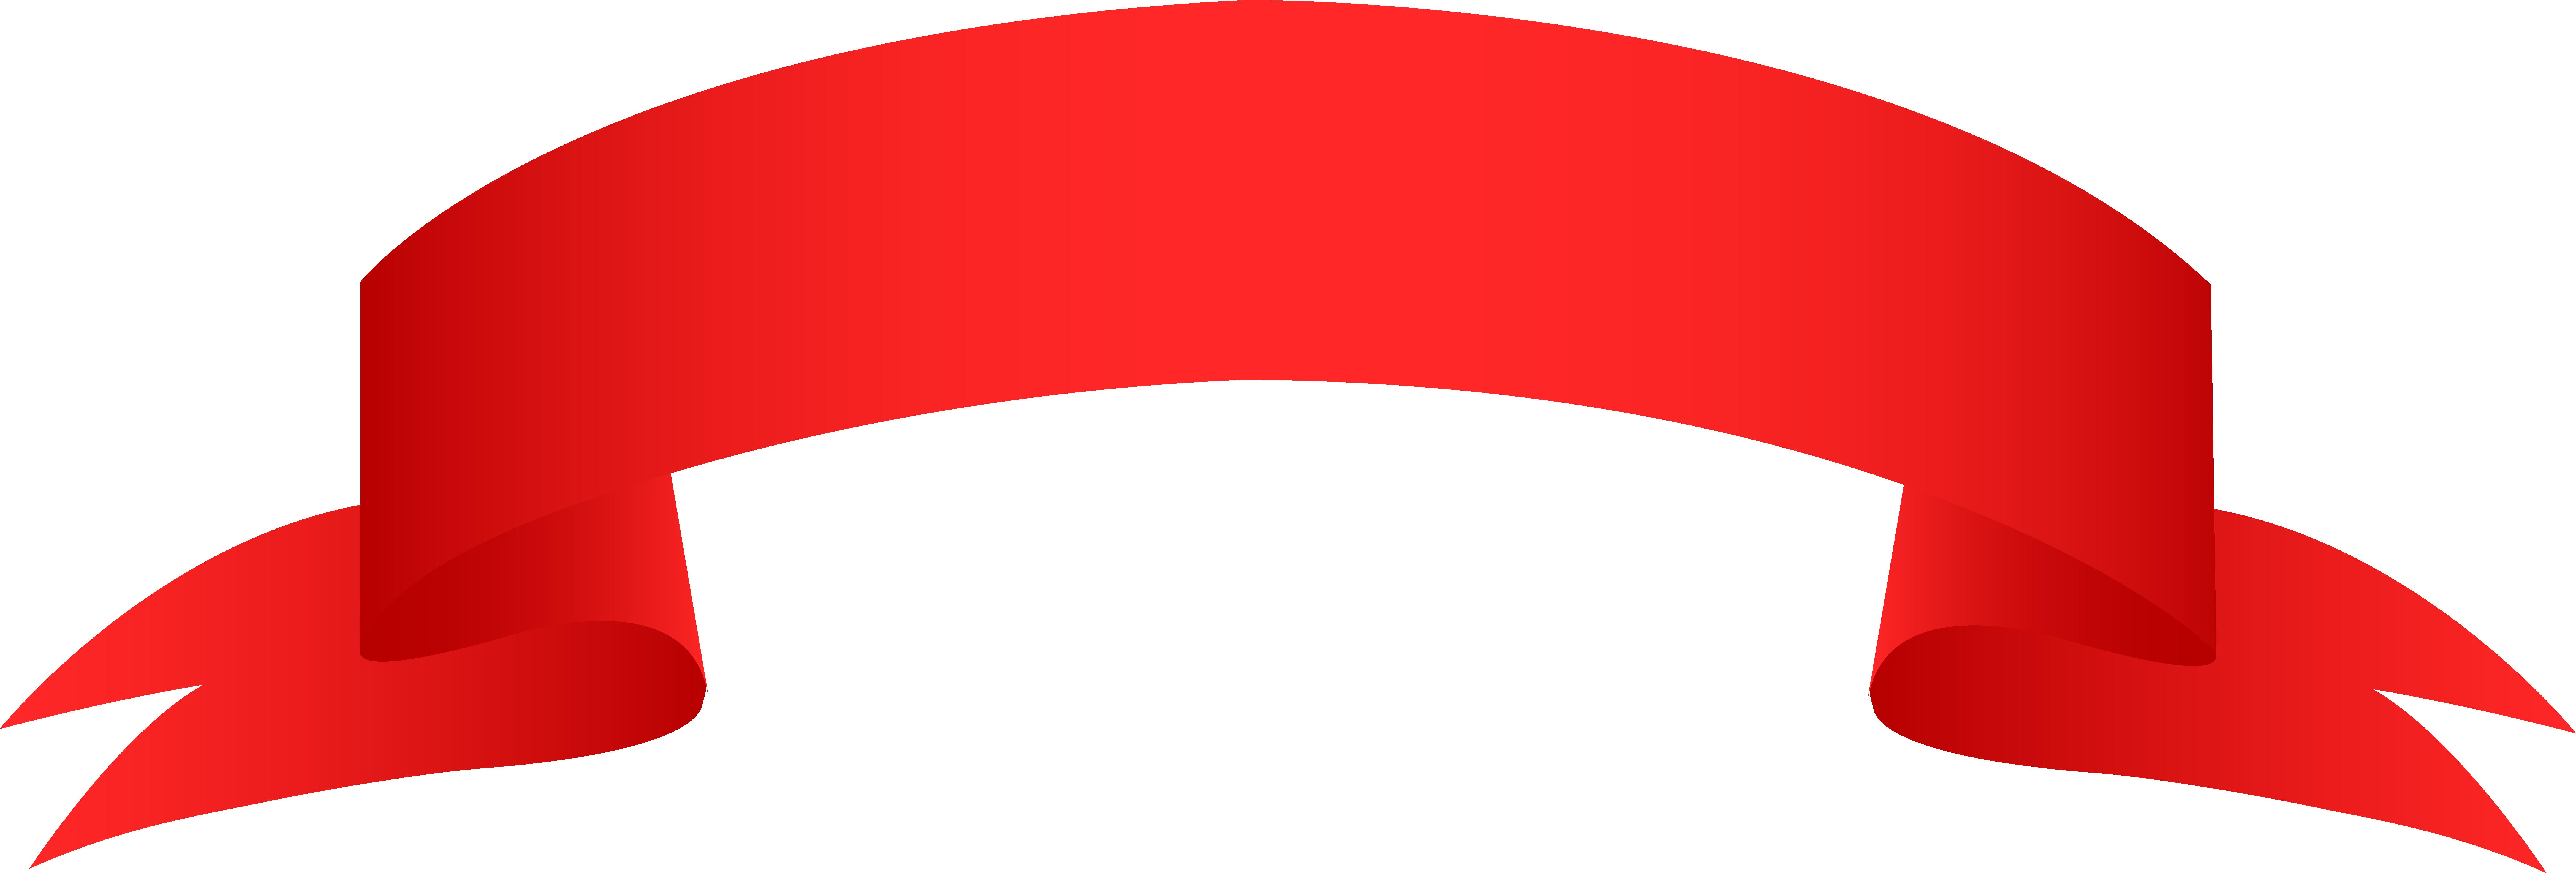 Red Ribbon PNG Image